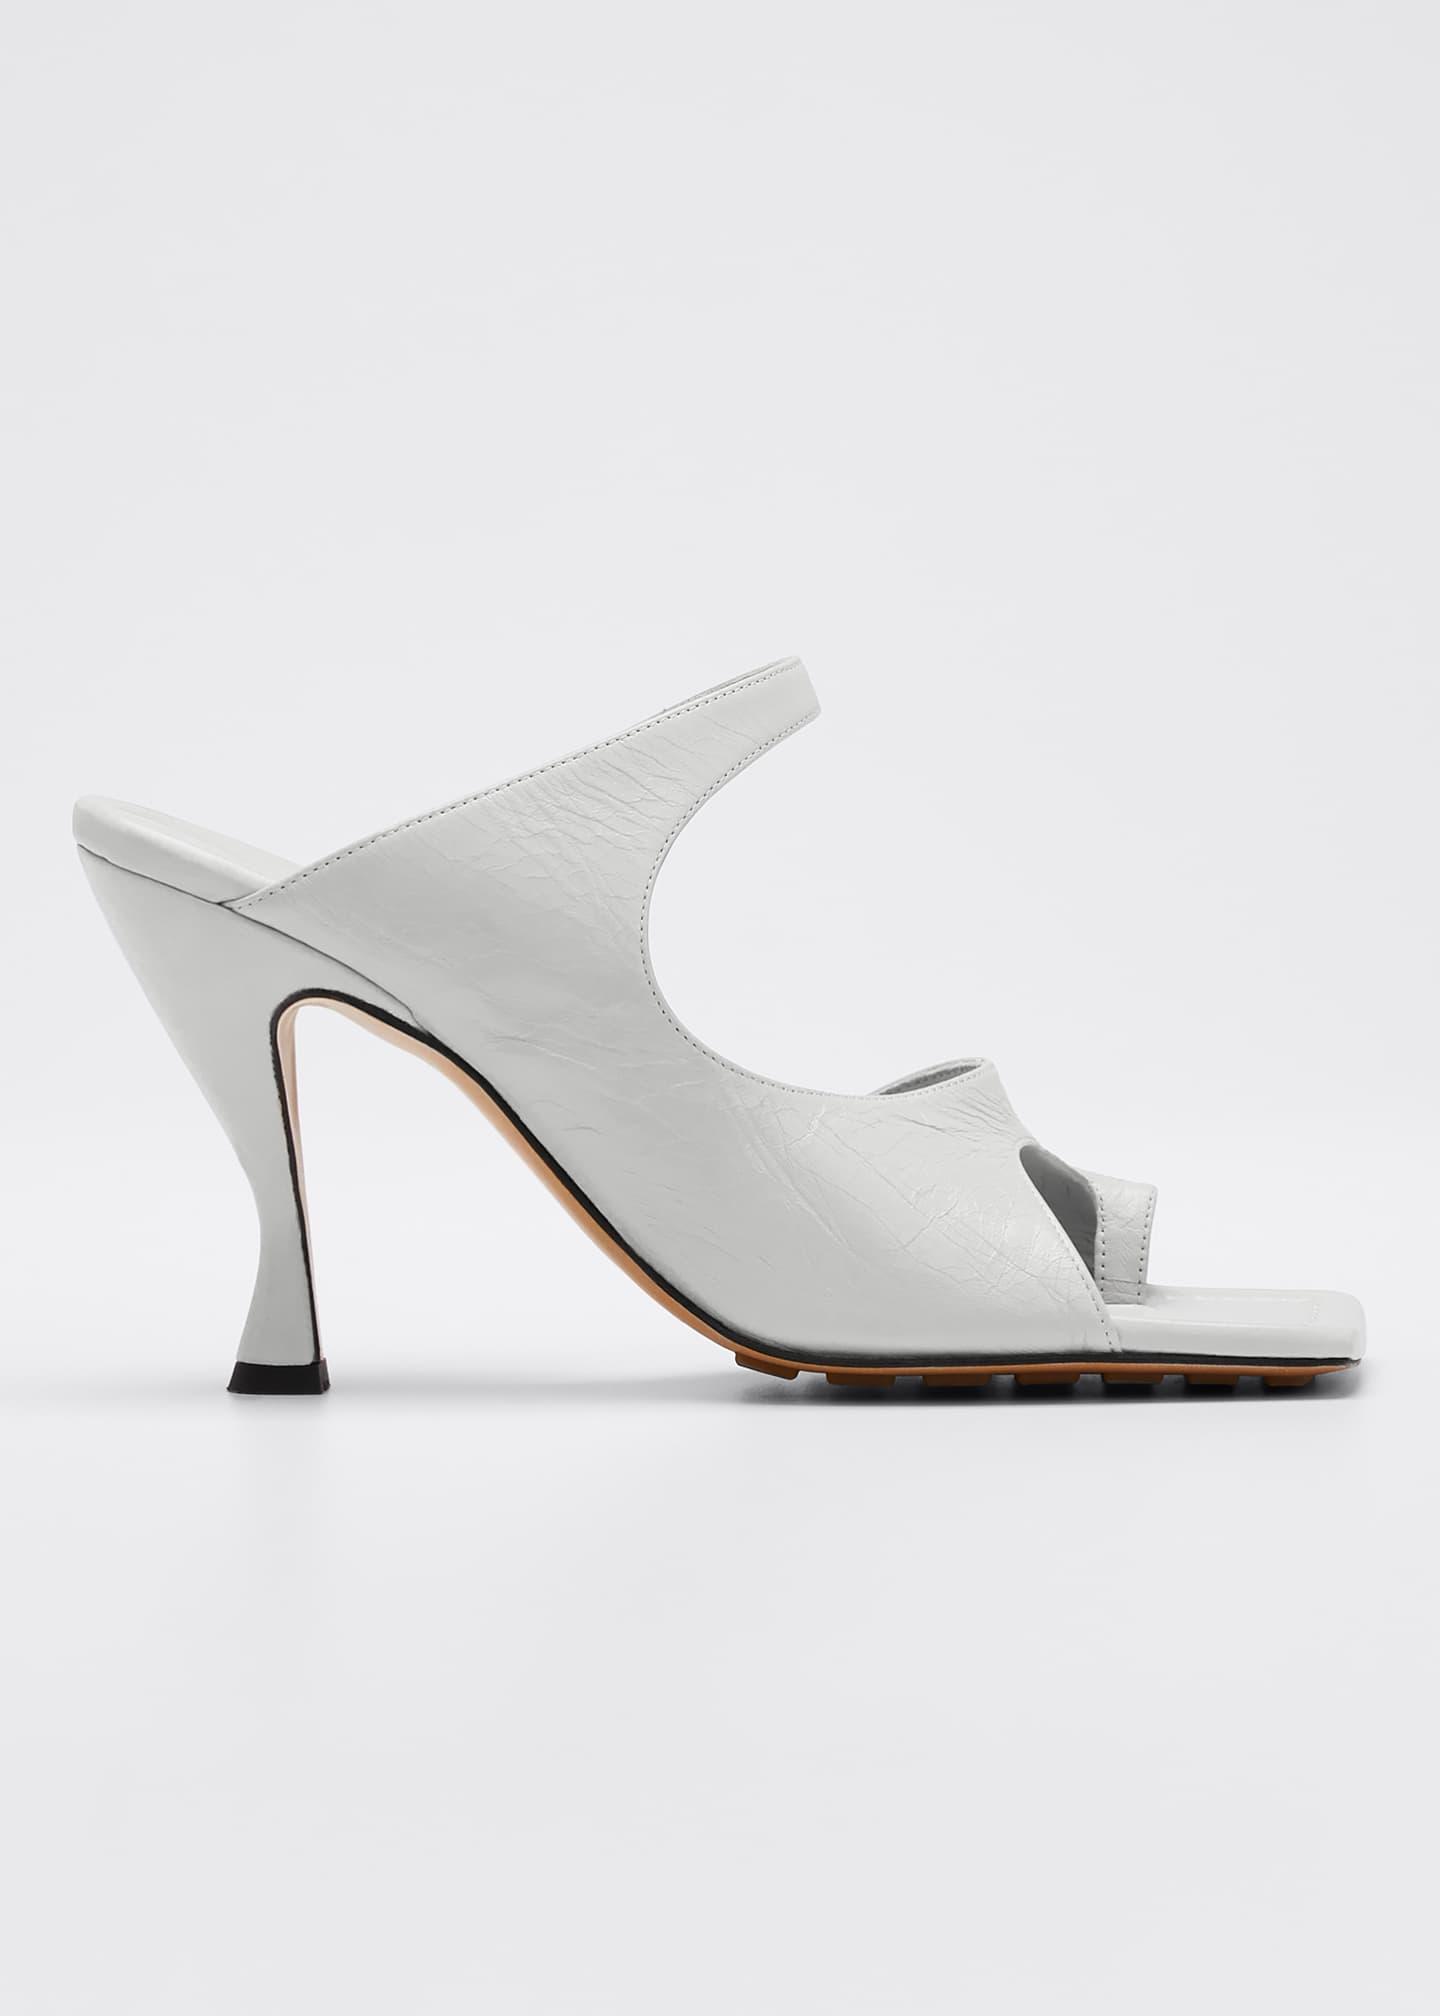 Bottega Veneta Crunch Lux Open-Square Mule Sandals